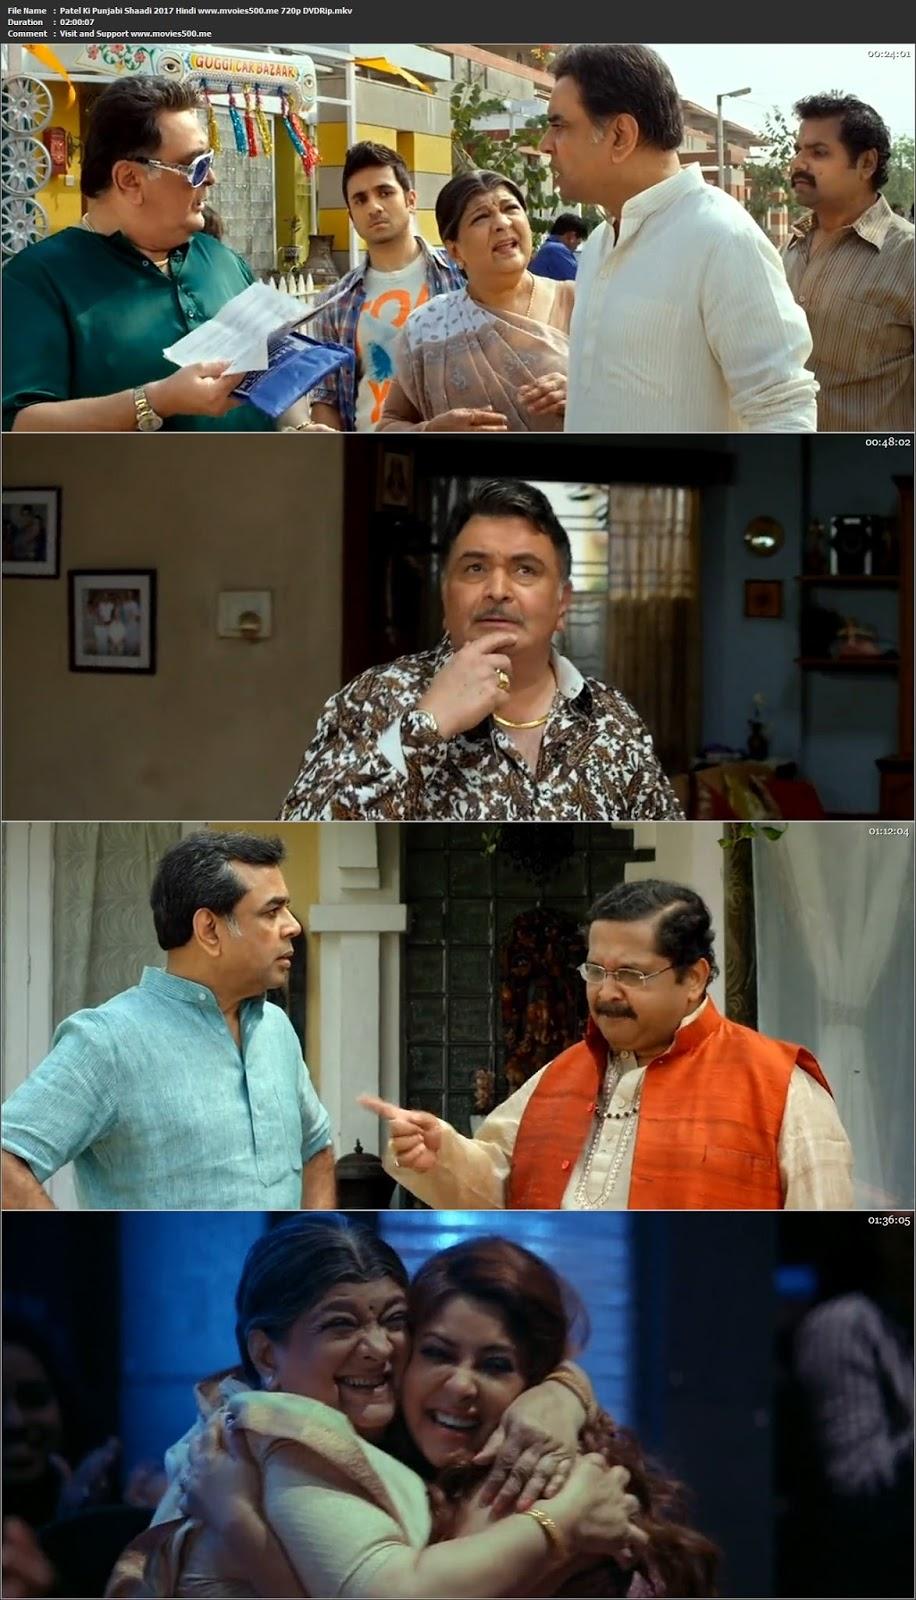 Patel Ki Punjabi Shaadi 2017 Punjabi Full Movie DVDRip 720p at sandrastclairphotography.com